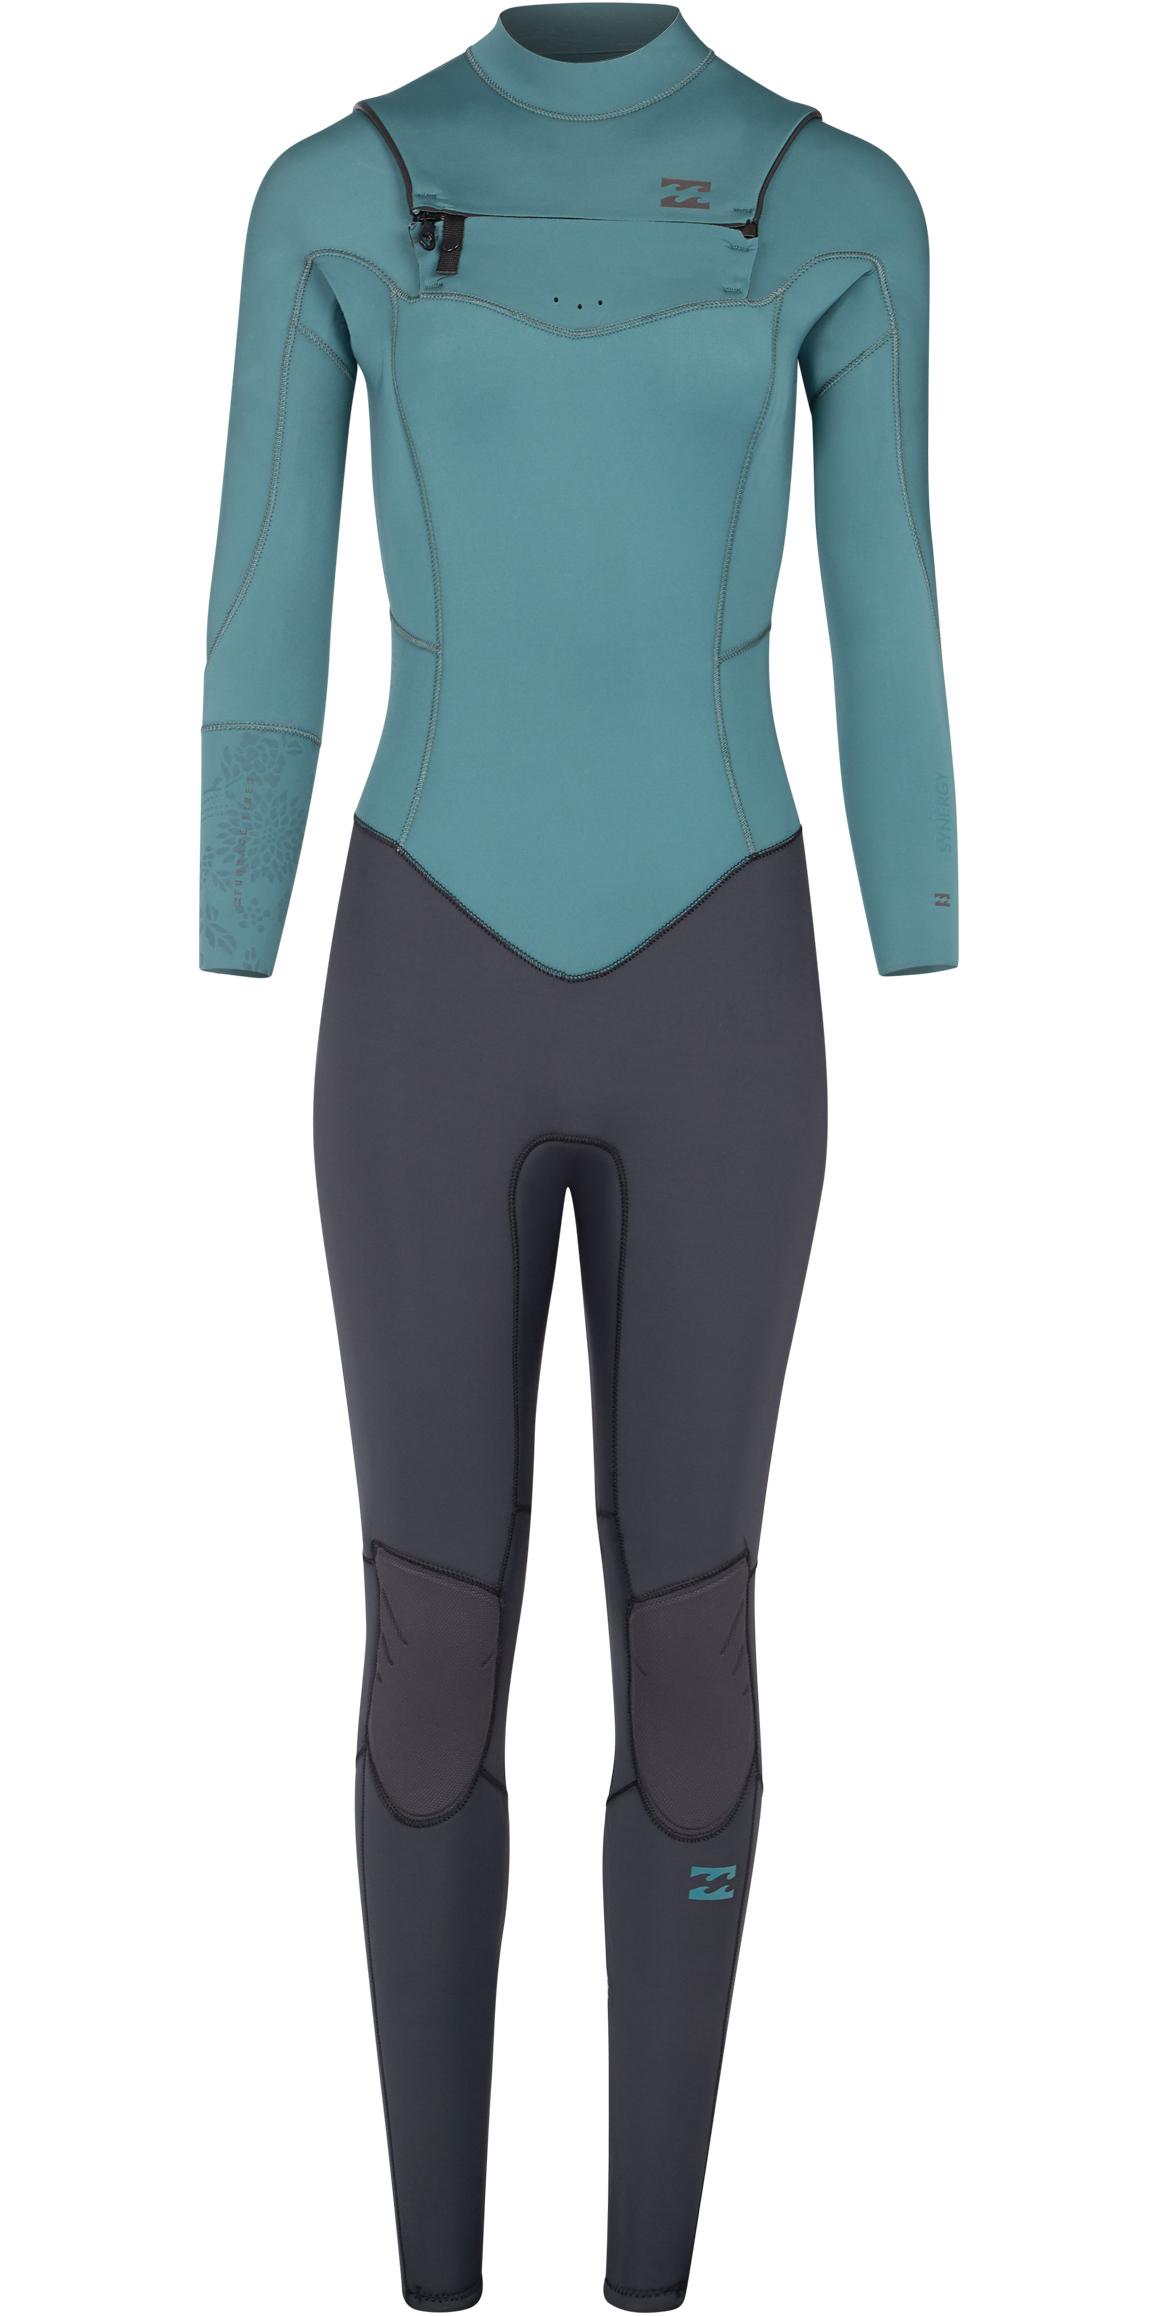 2019 Billabong Womens Furnace Synergy 5/4mm Chest Zip Wetsuit Sugar Pine L45G03